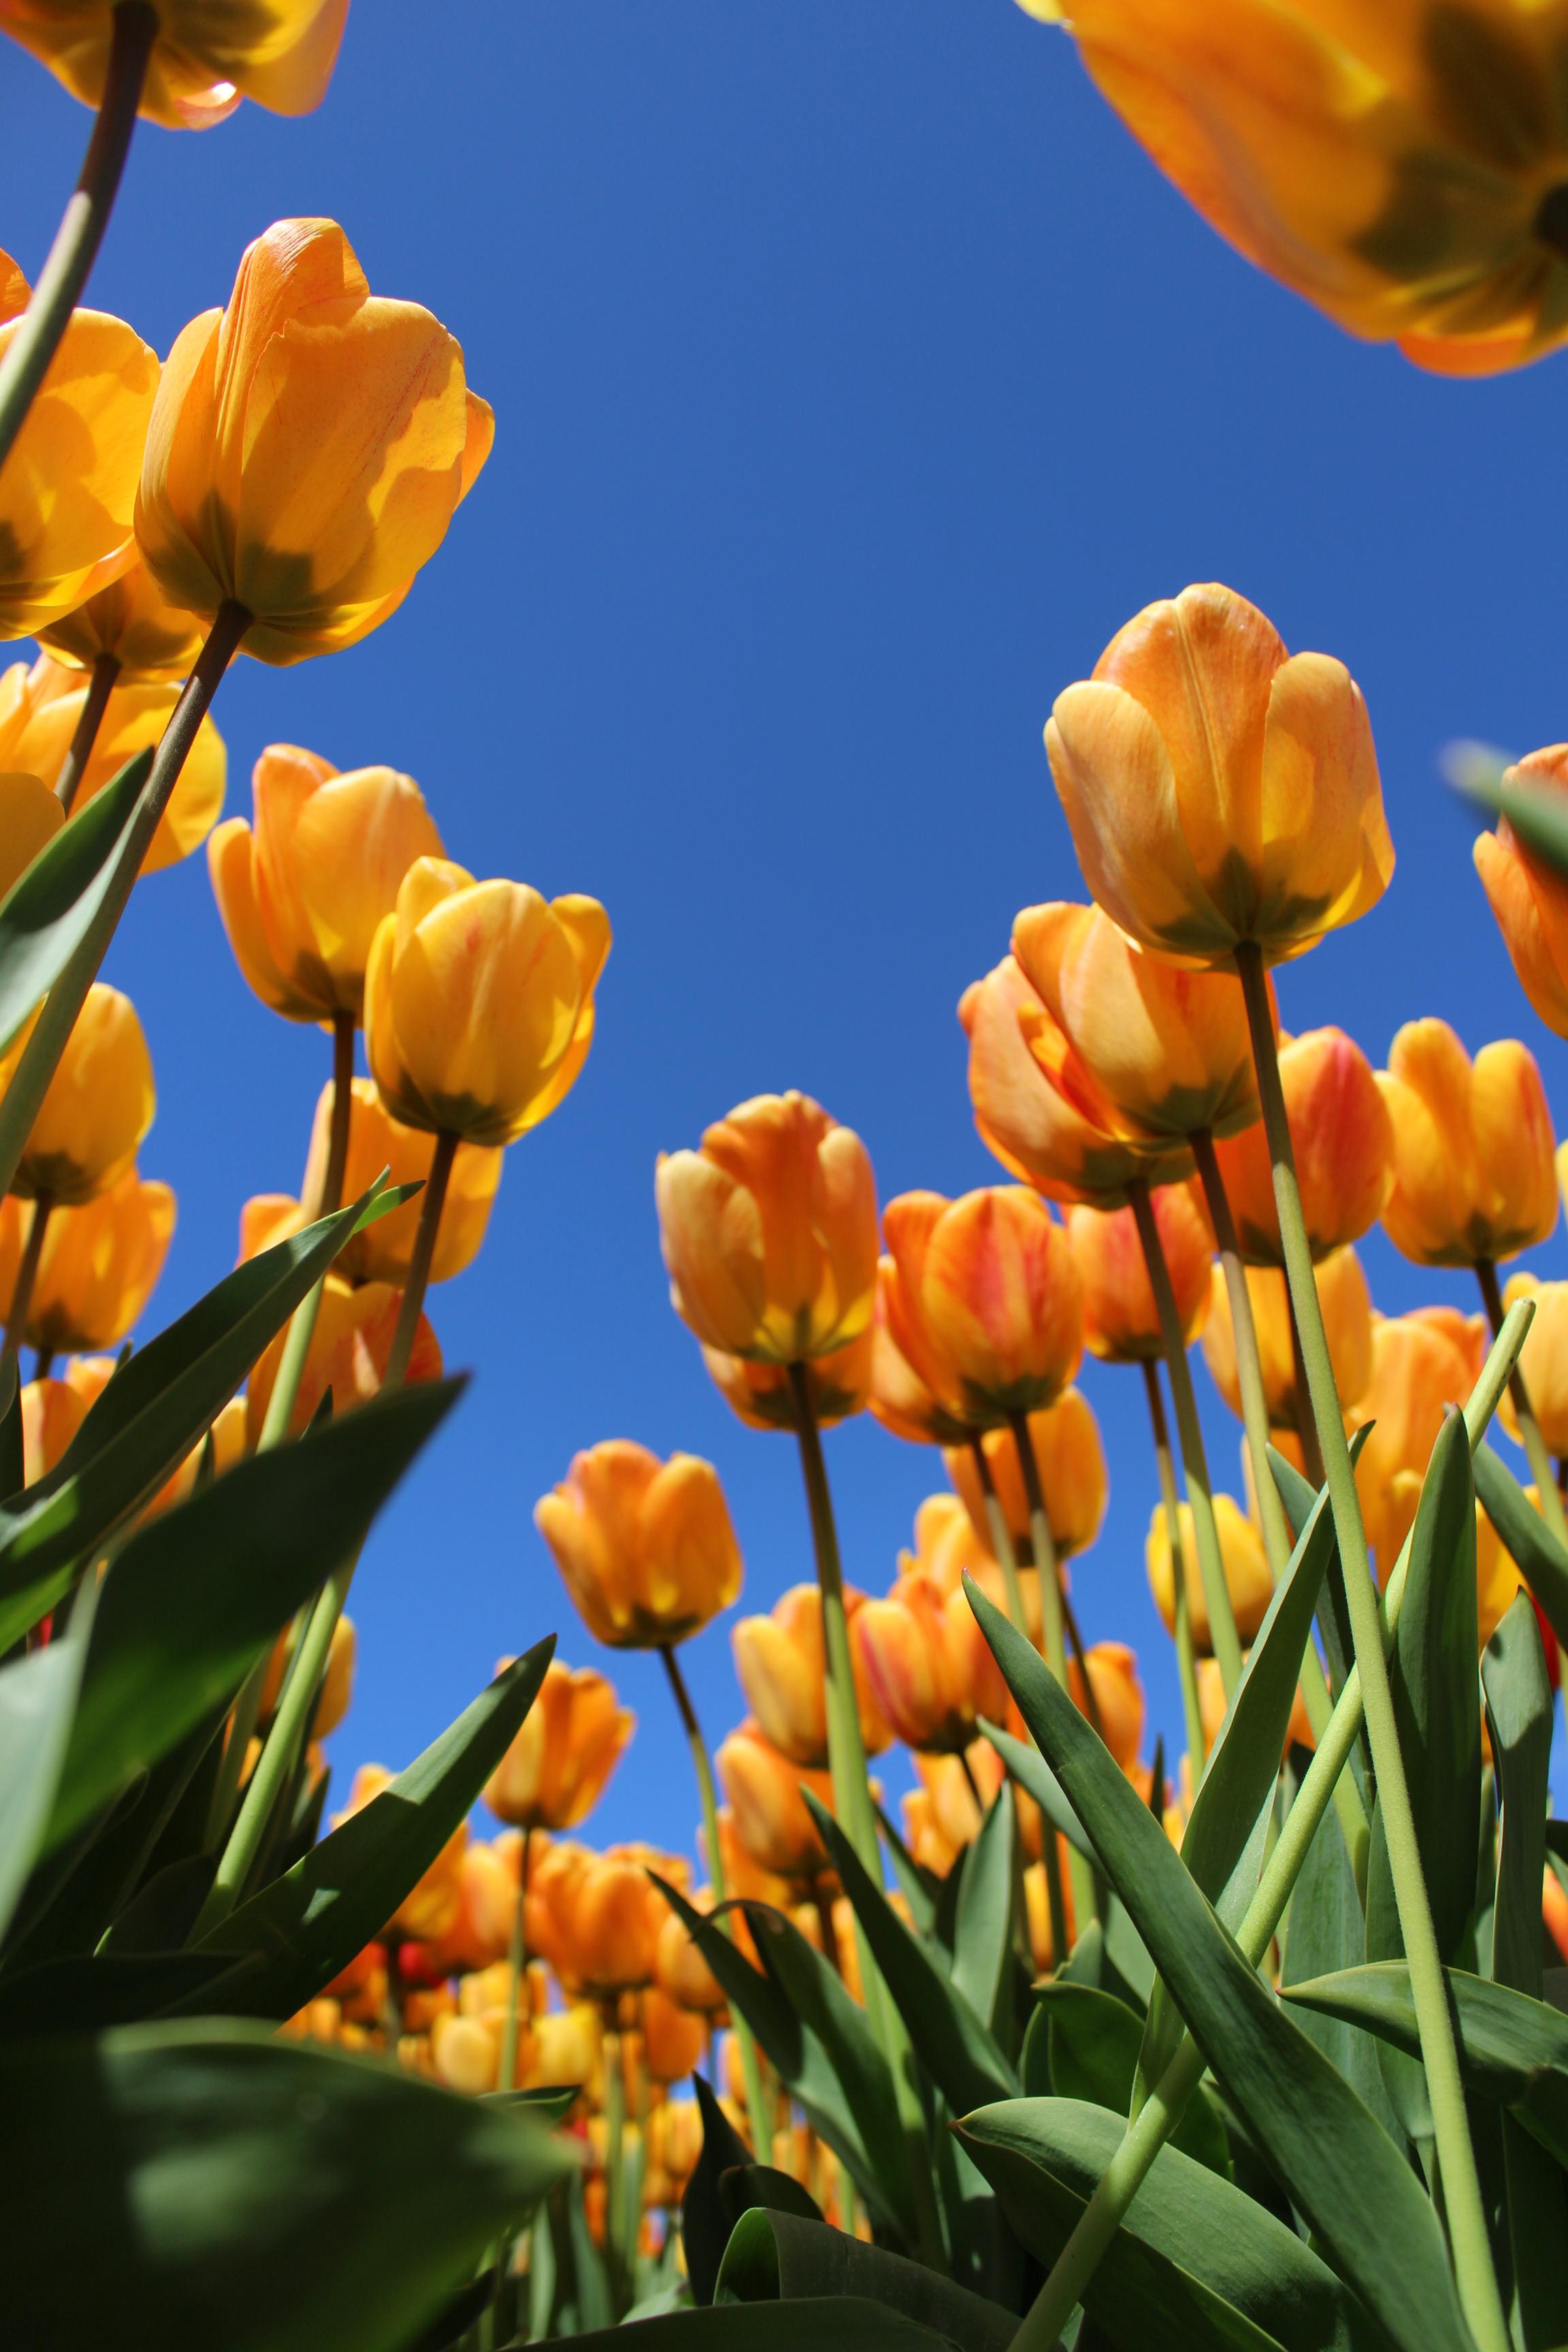 Bollenvelden Tulpen Hike